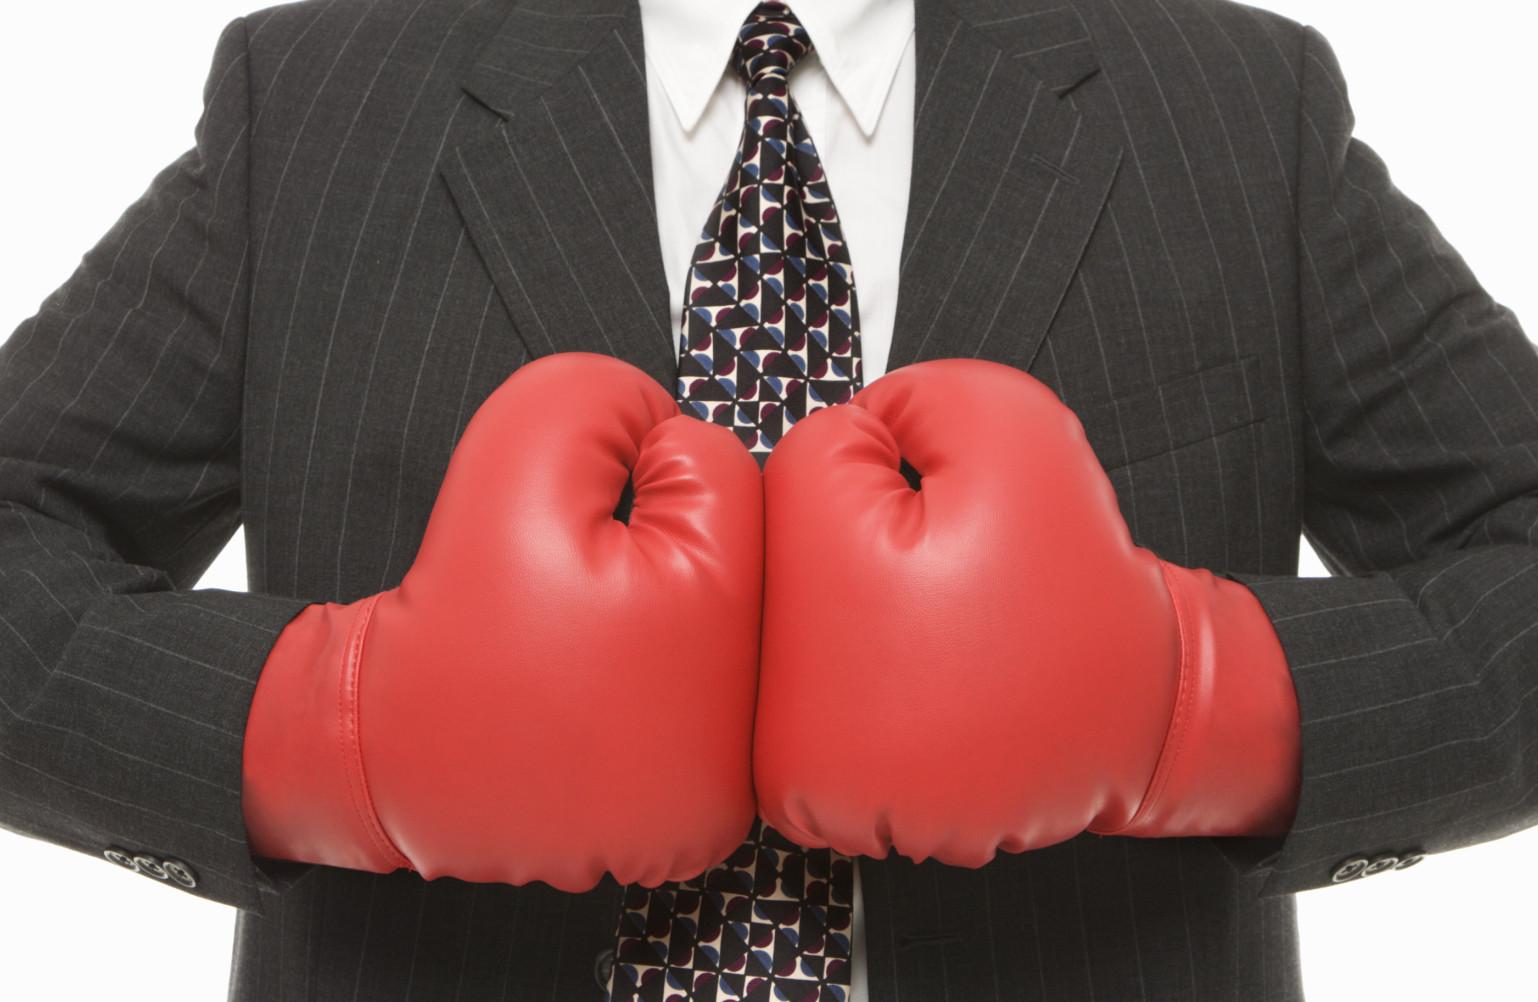 ICBA Boxing